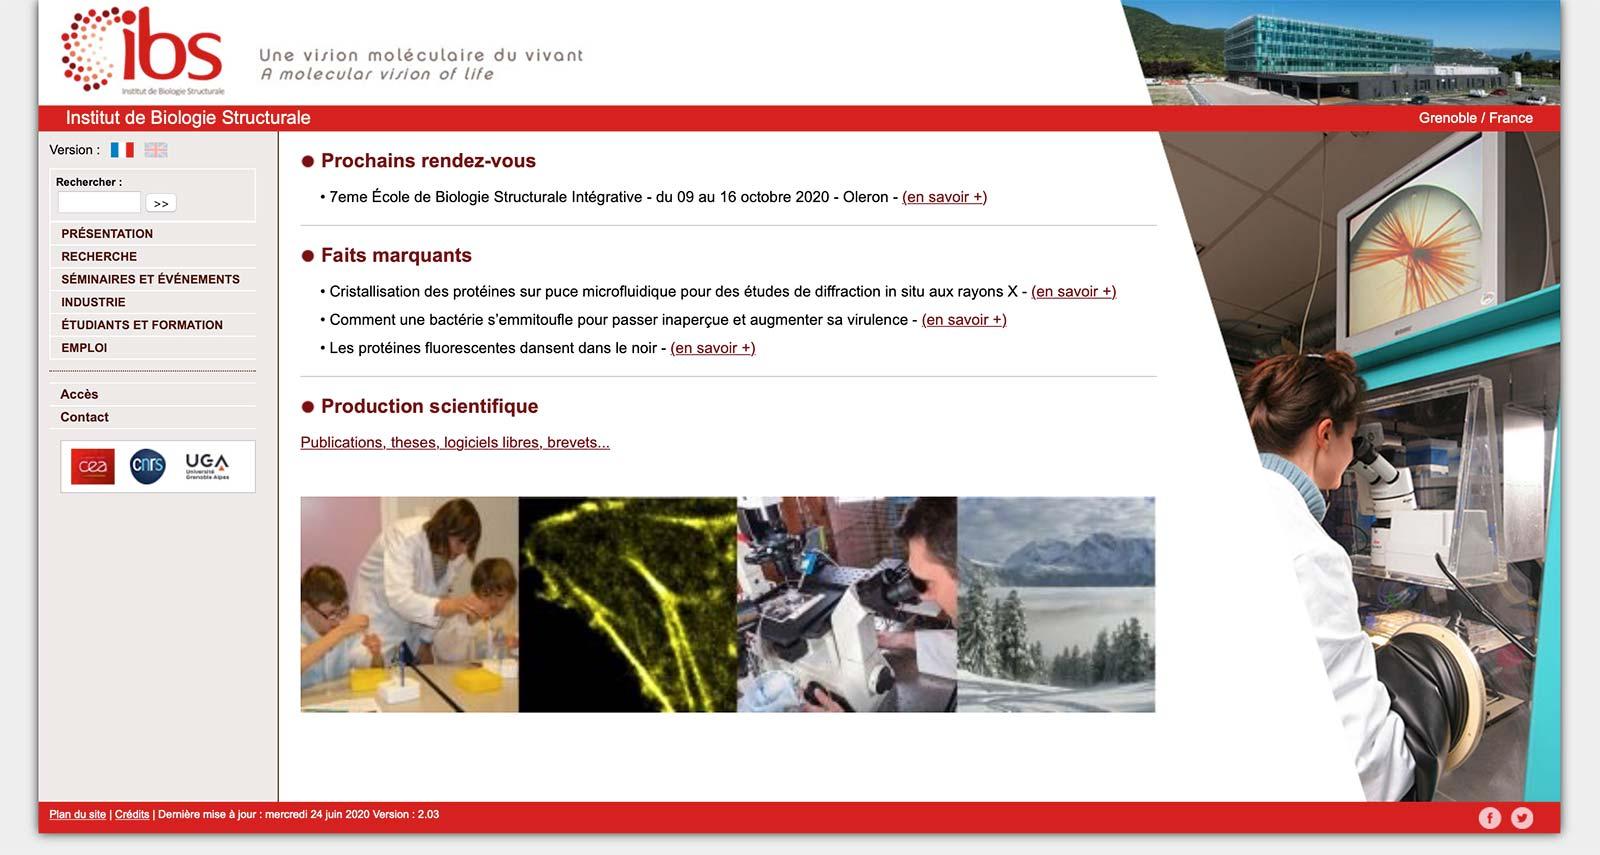 ibs-webdesign-science-recherche-grenoble